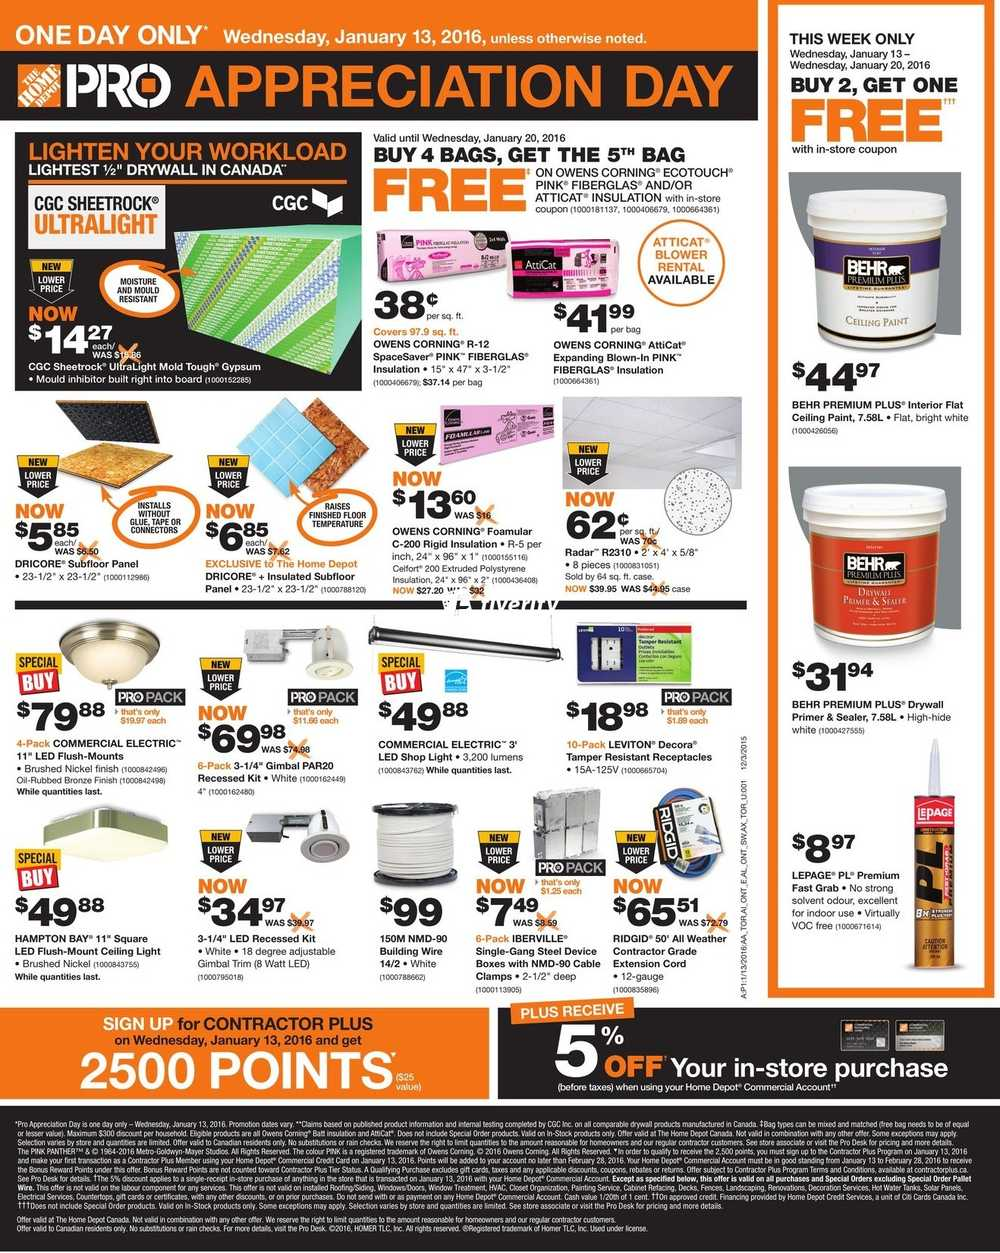 Home Depot Commercial : Home depot commercial account